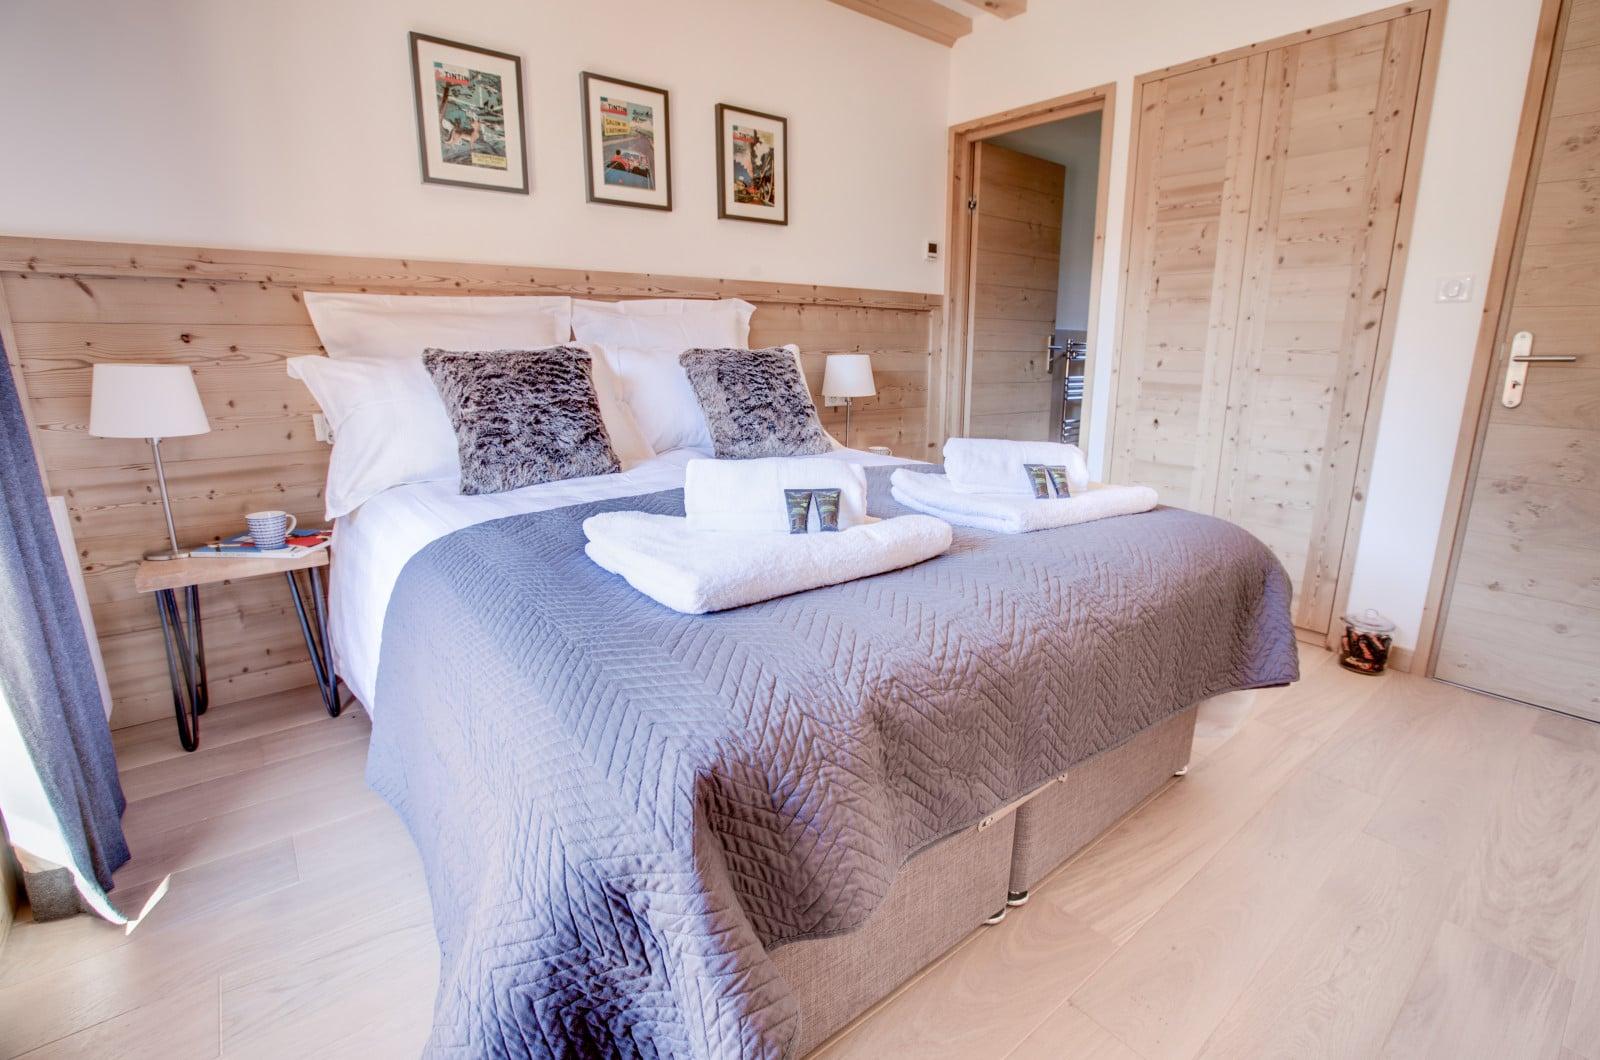 chalet north star bedroom 3